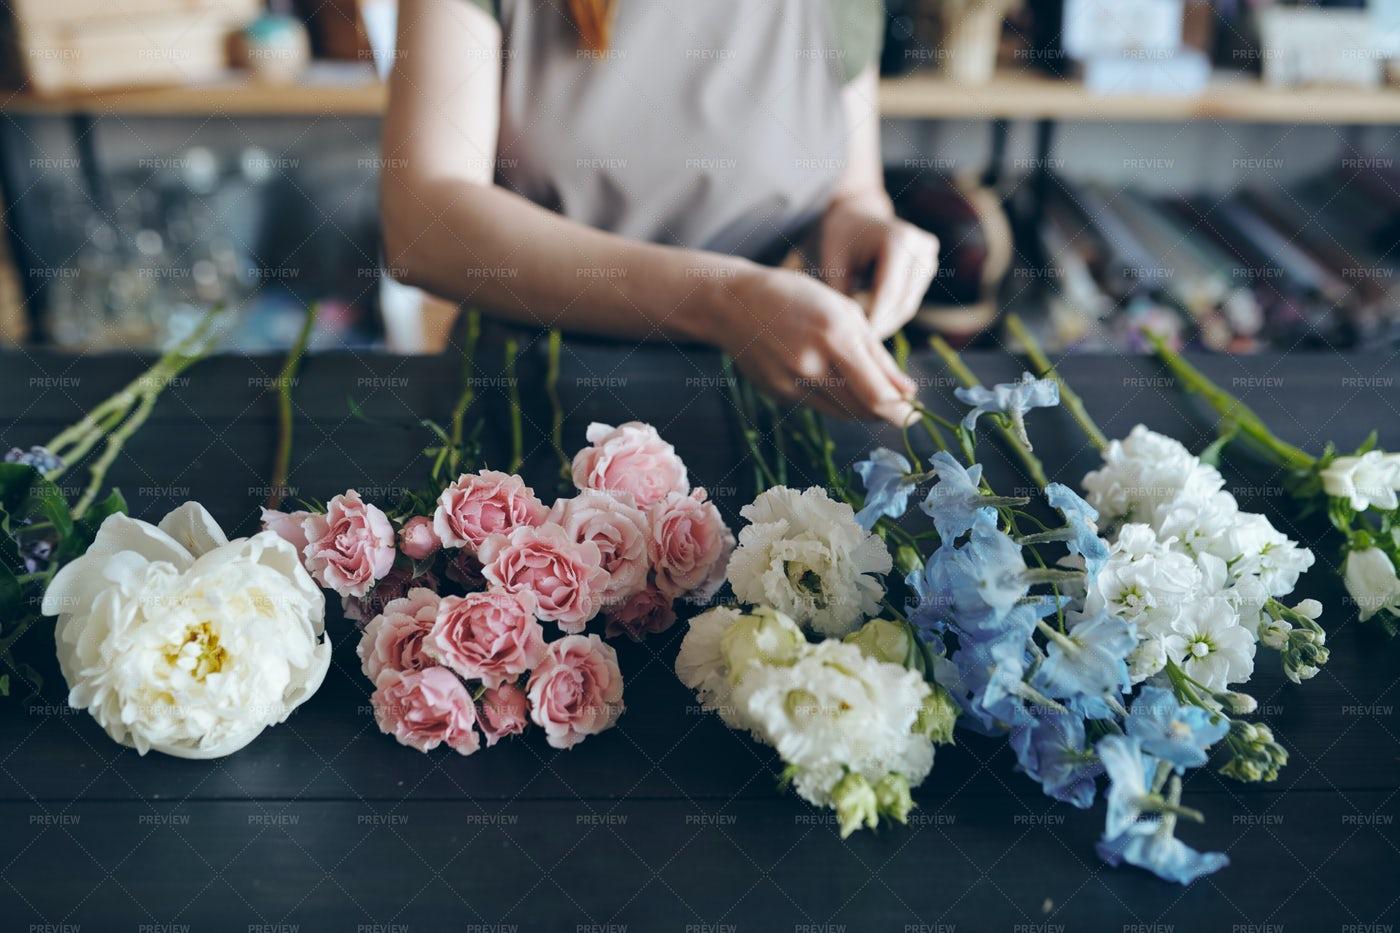 Preparing Flower For Arranging...: Stock Photos